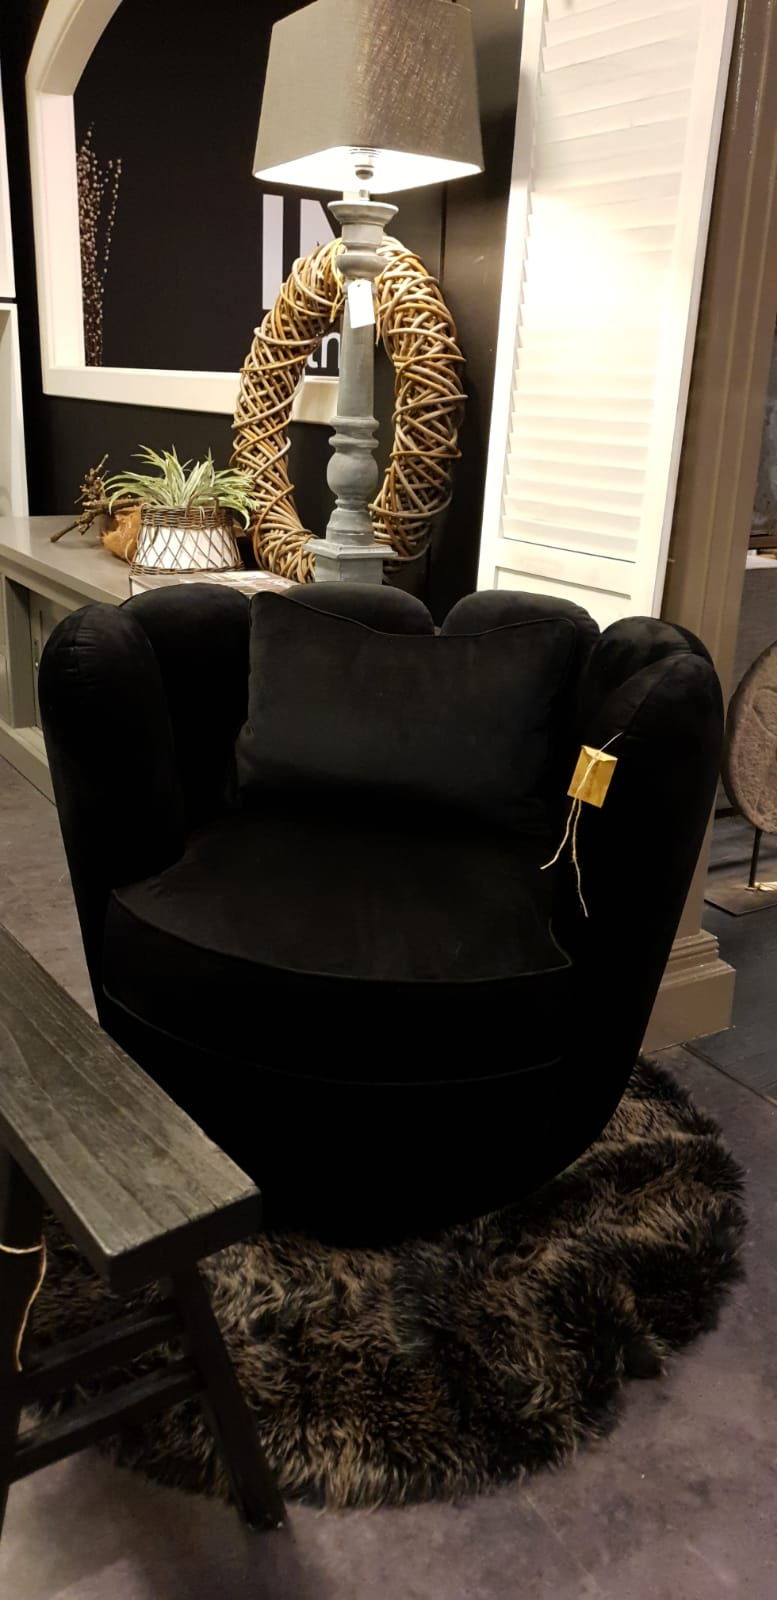 Moderne fluwelen fauteuil. Stijlvol designer stoeltje.